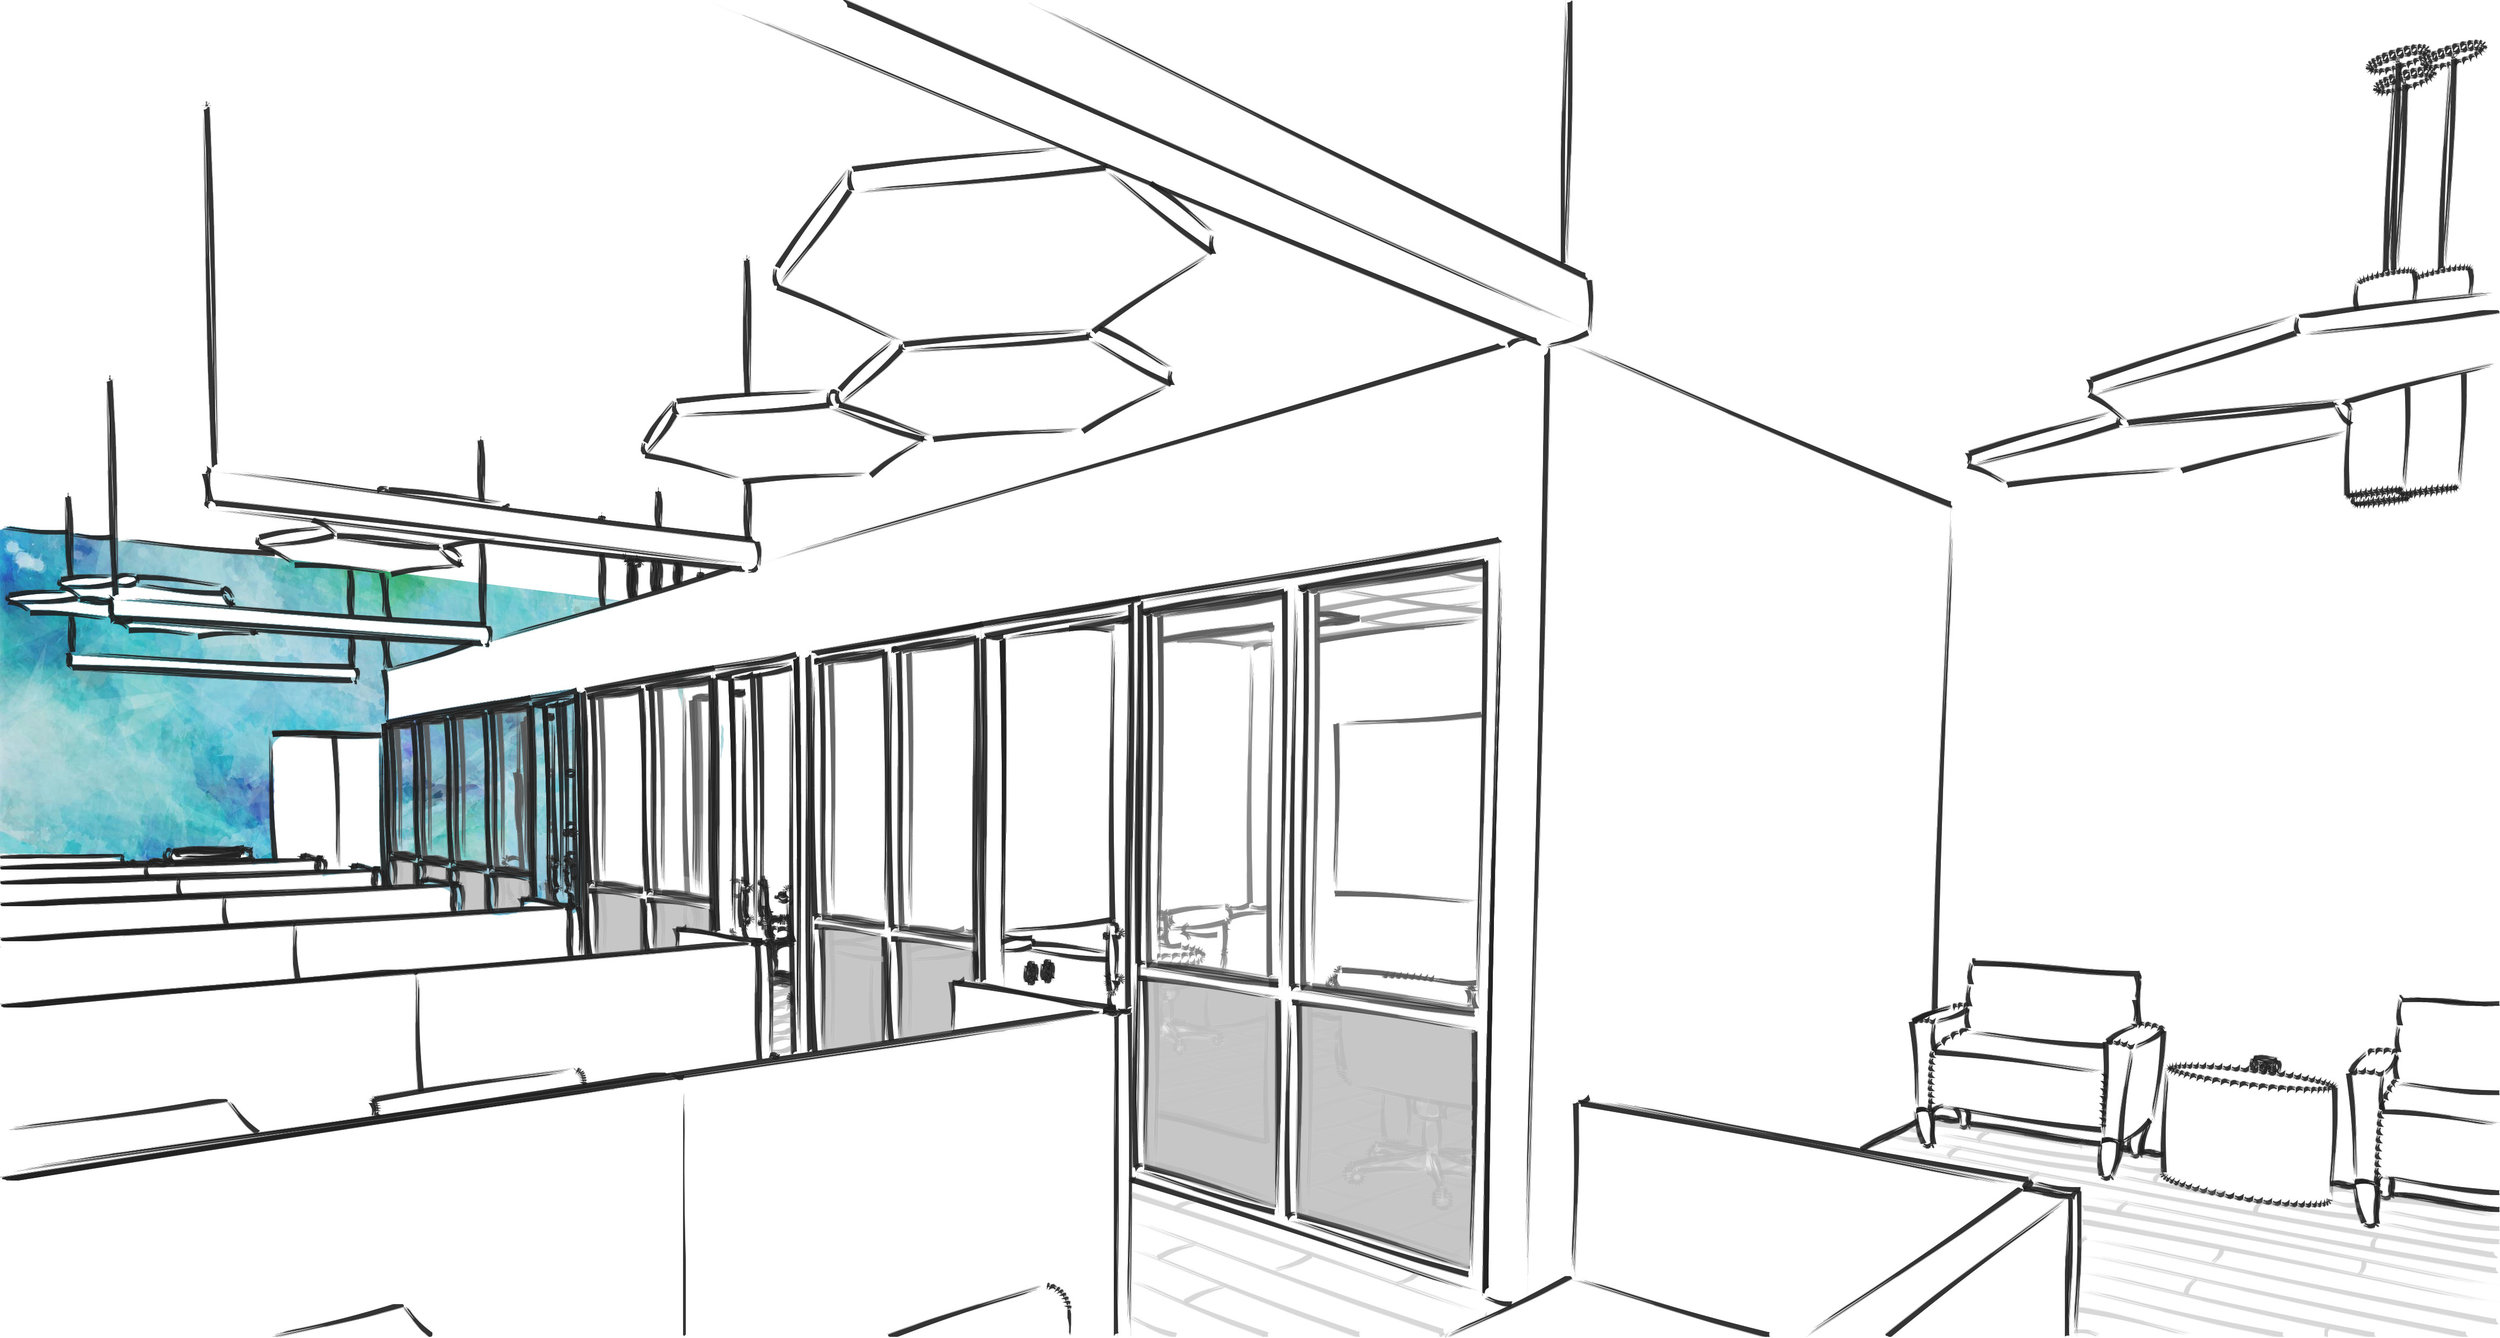 Back Wall Sketch.jpg